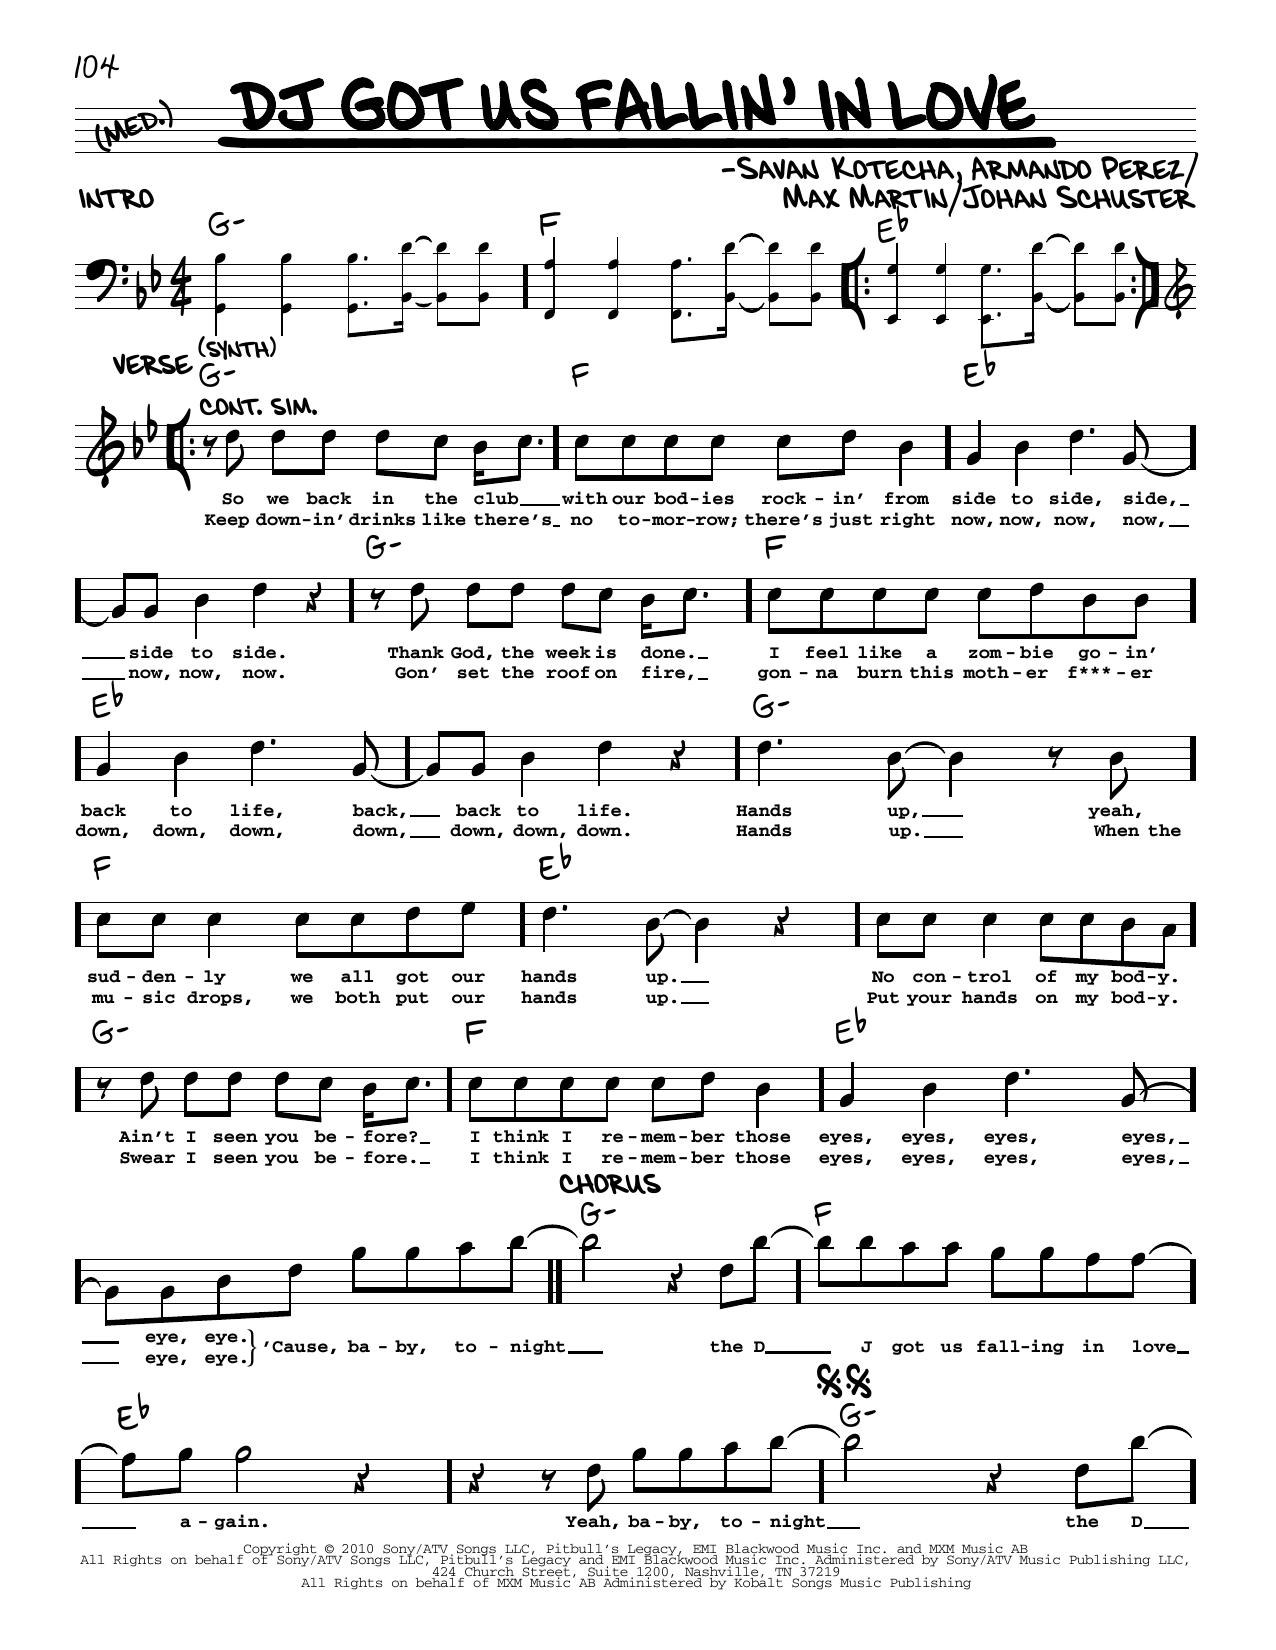 Usher featuring Pitbull DJ Got Us Fallin' In Love sheet music notes printable PDF score